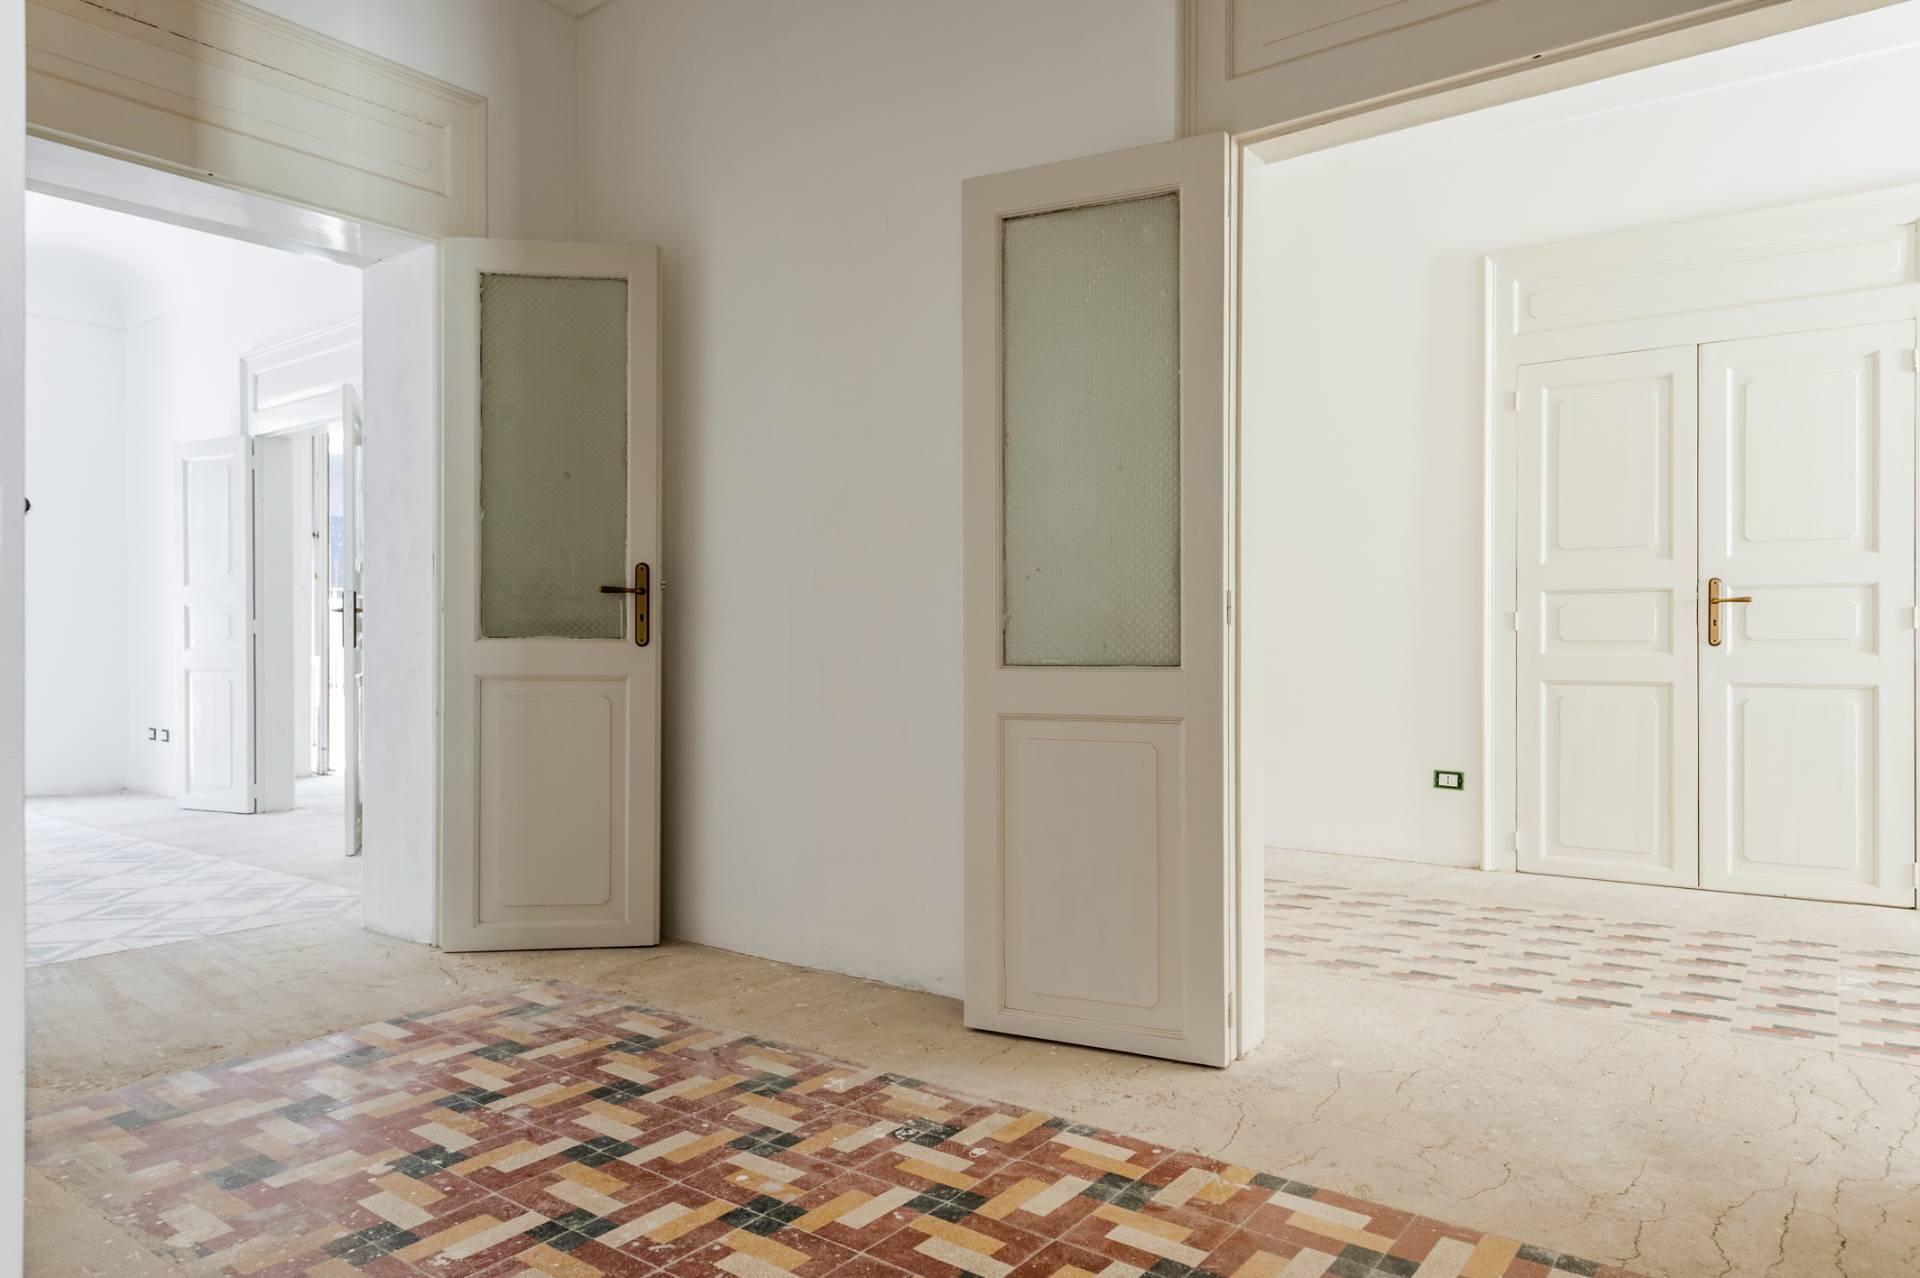 Palazzo in Vendita a Siracusa: 5 locali, 500 mq - Foto 11